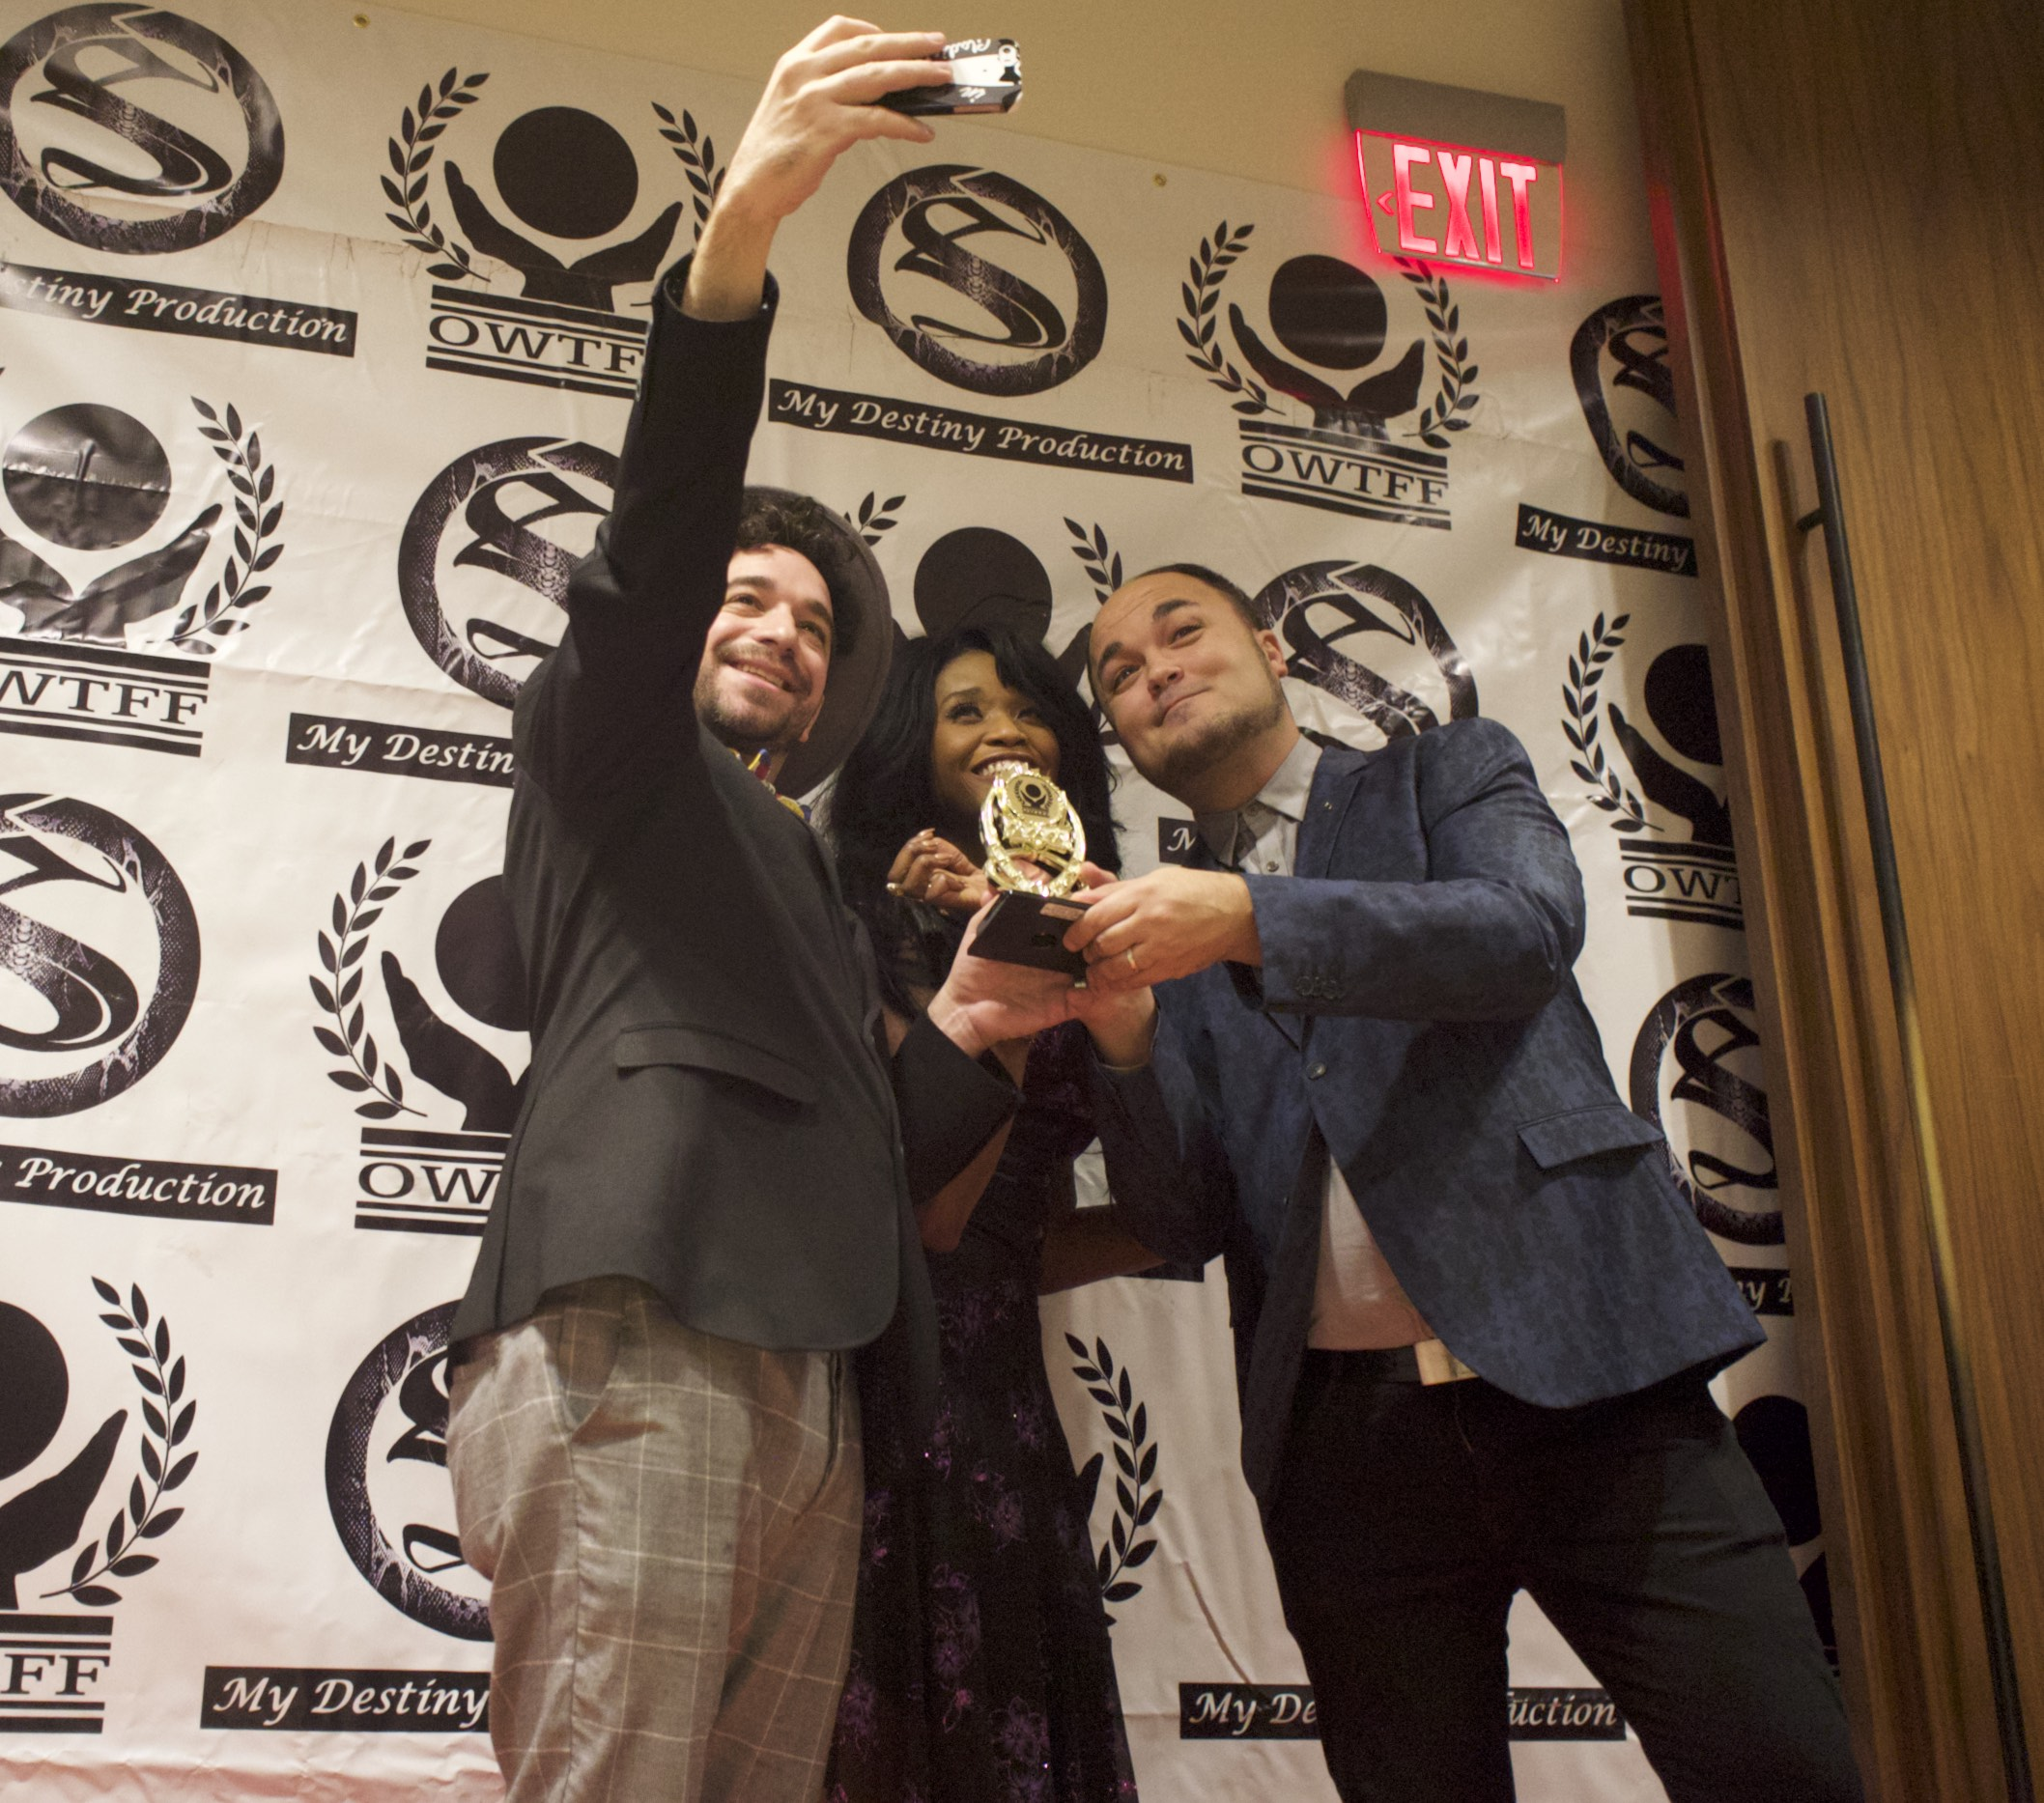 photo-by-michael-morrow-open-world-toronto-film-festival-2016-12